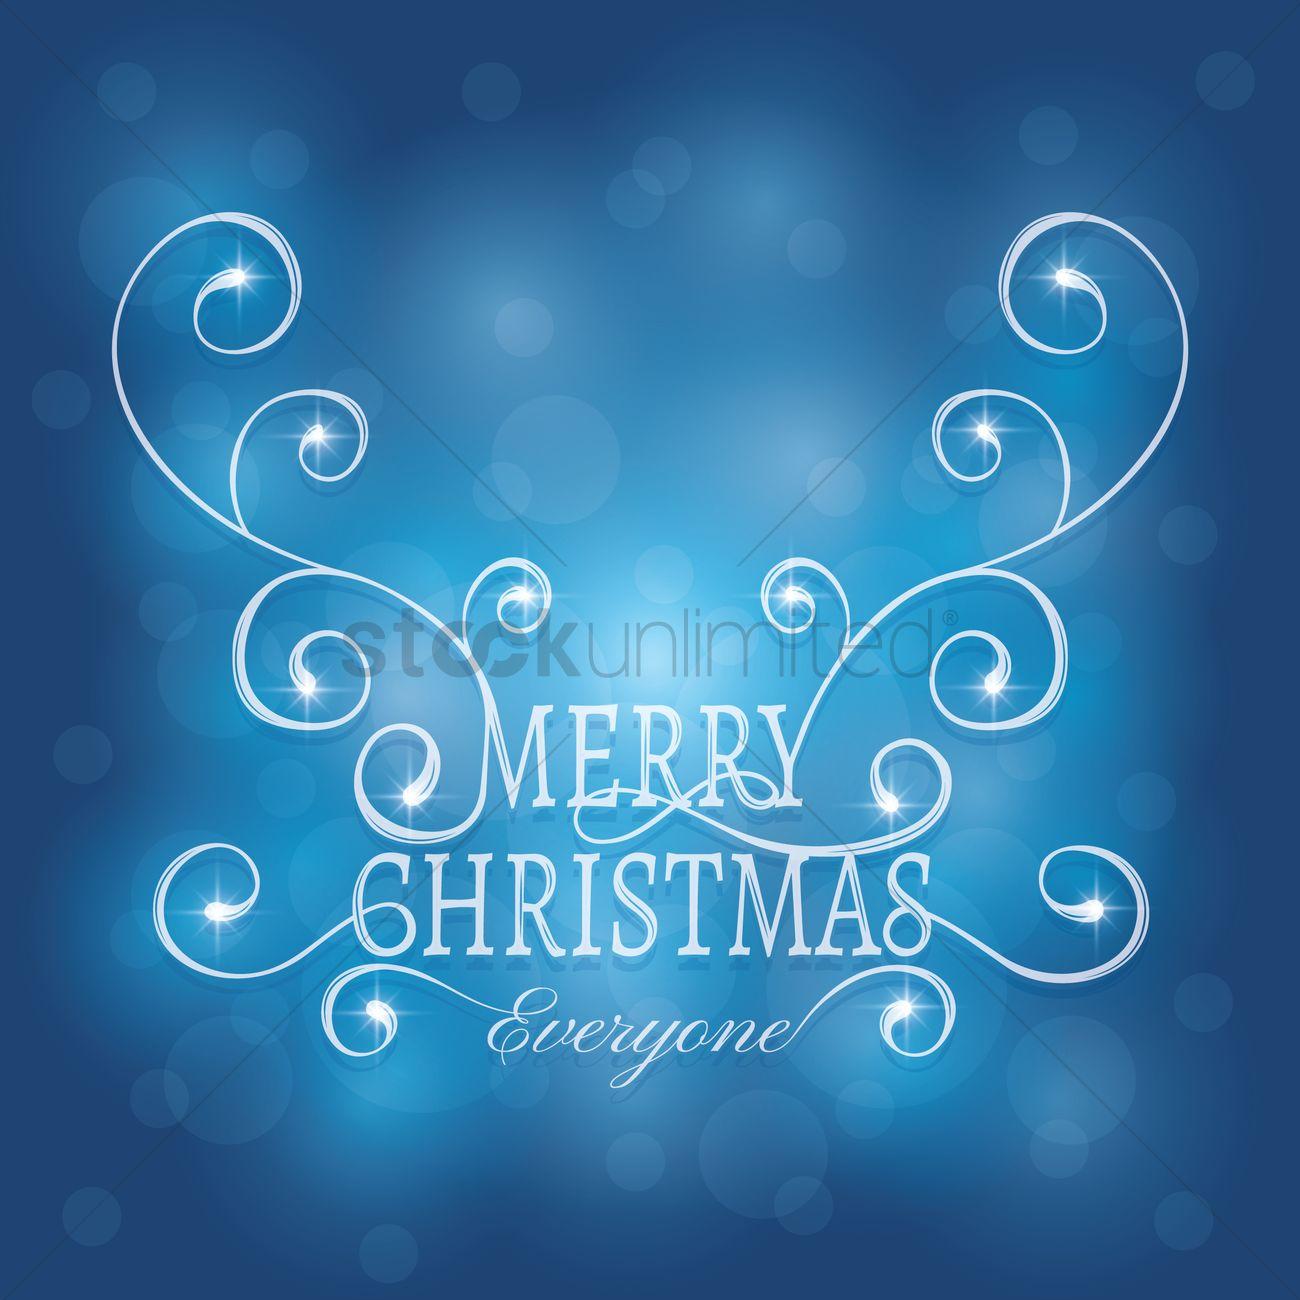 Merry christmas greetings vector image 1812205 stockunlimited merry christmas greetings vector graphic m4hsunfo